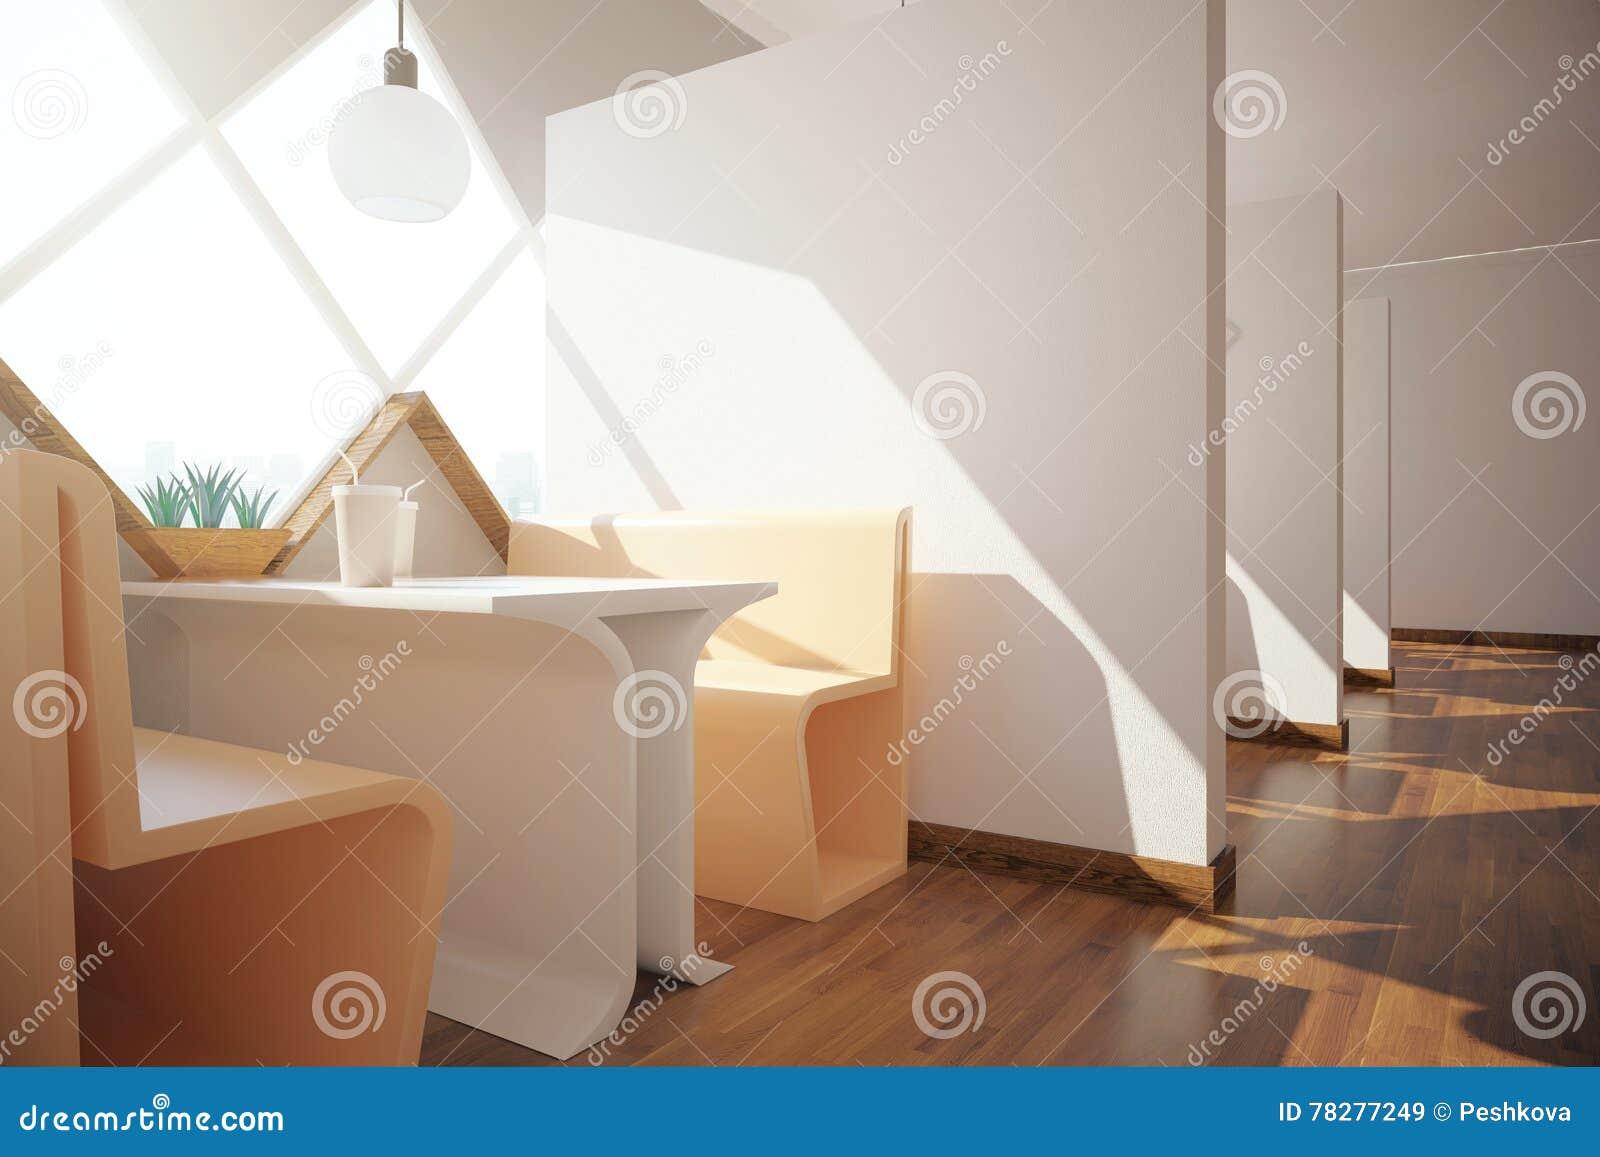 modern cafe interior stock illustration - image: 78277249